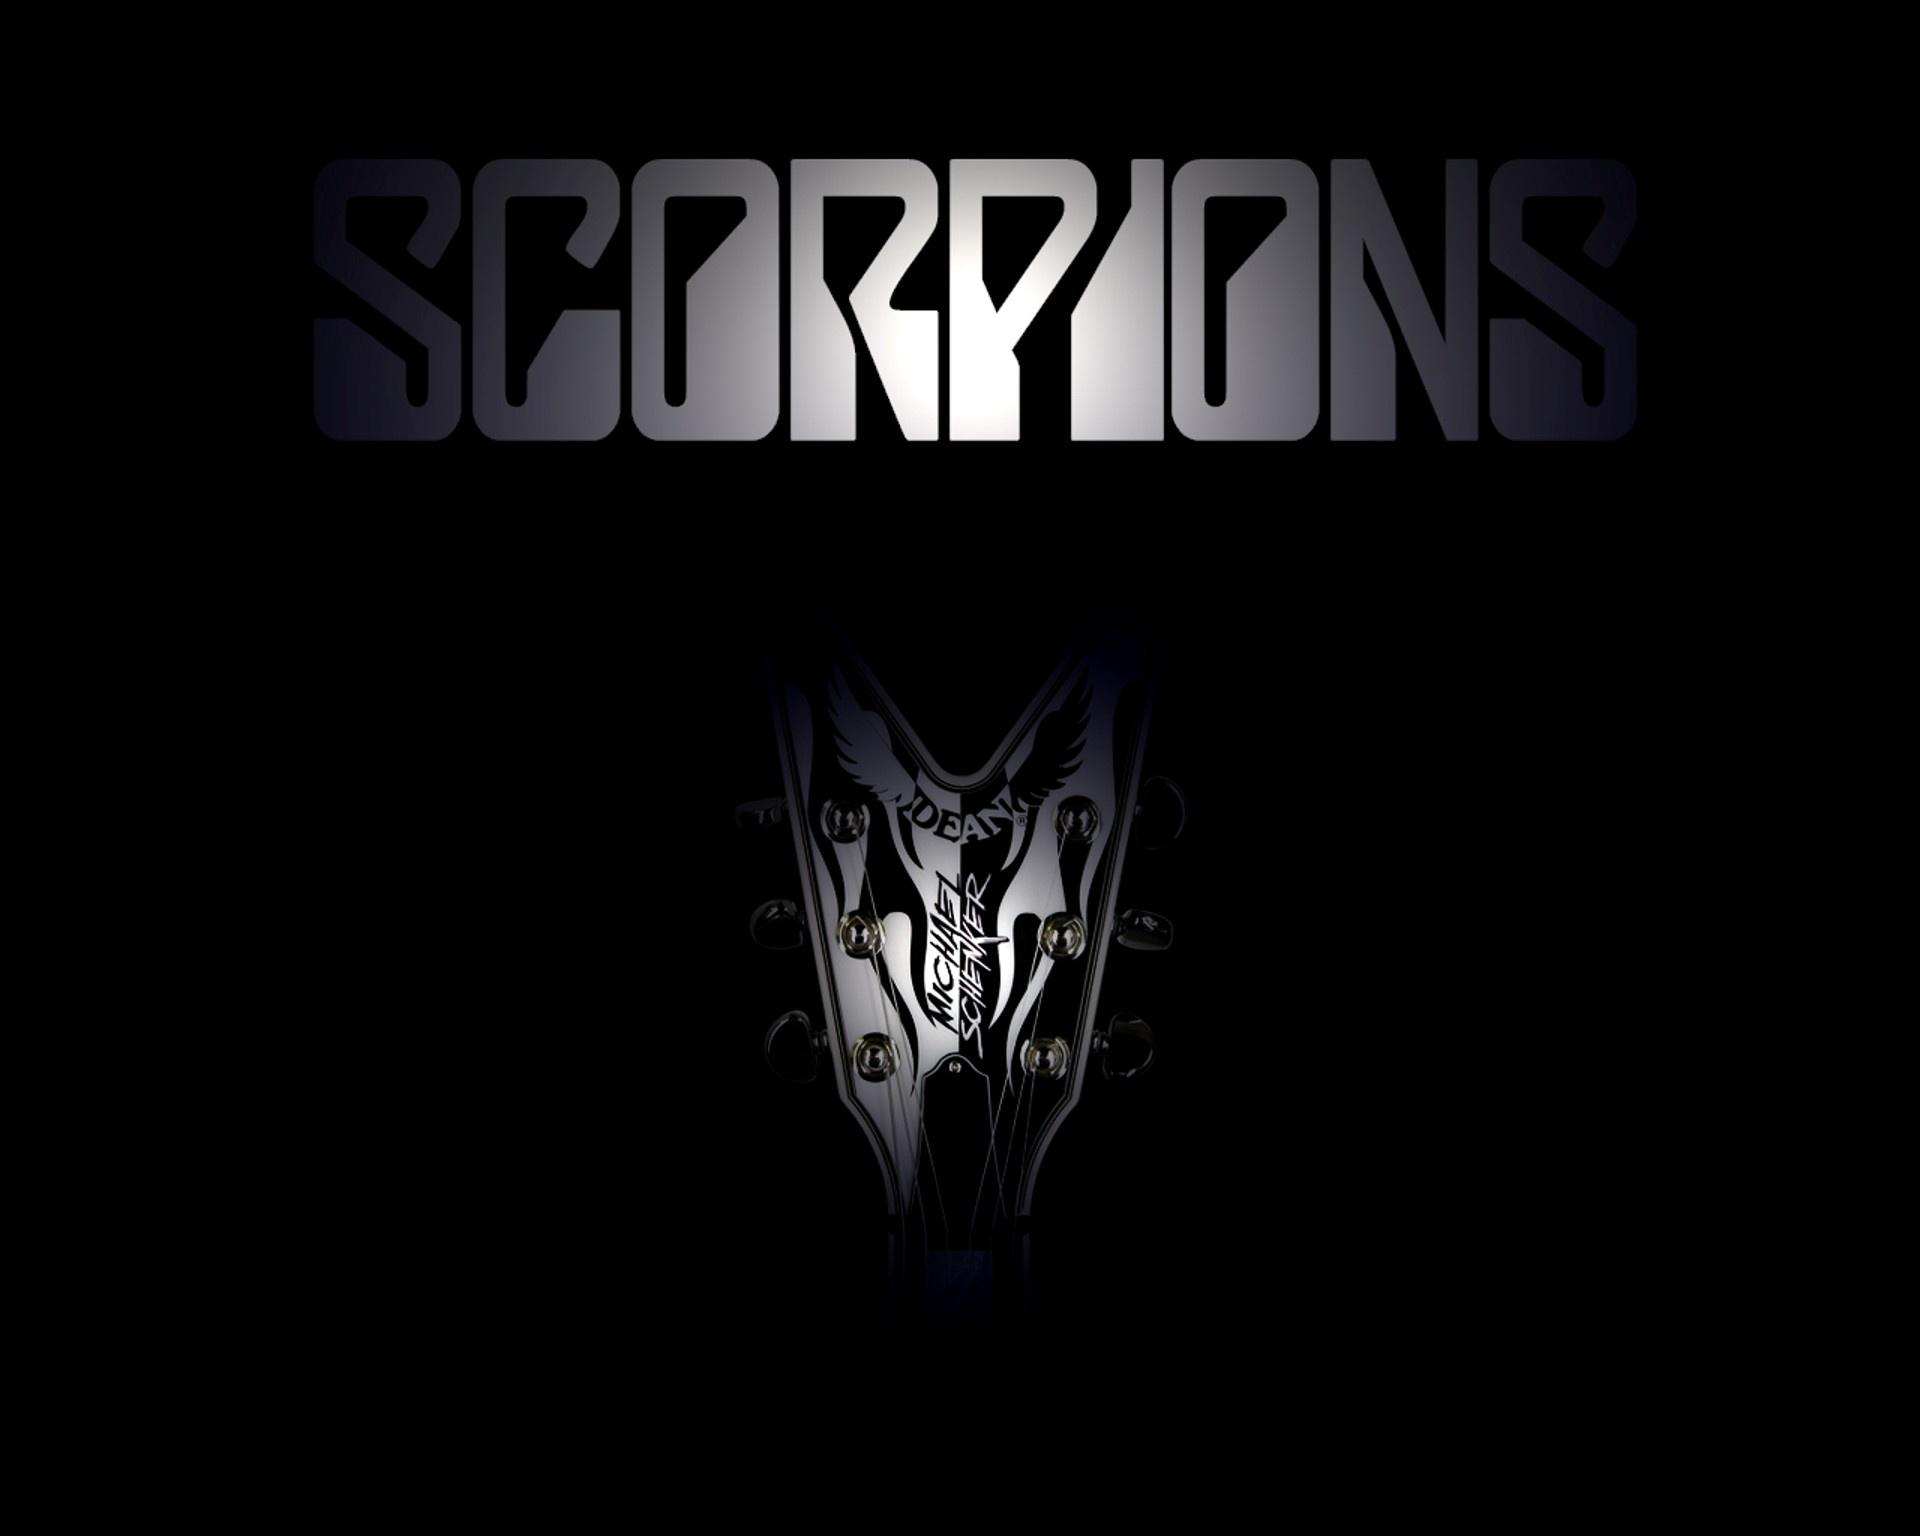 scorpions logo - Pesquisa do Google | SCORPIONS | Pinterest